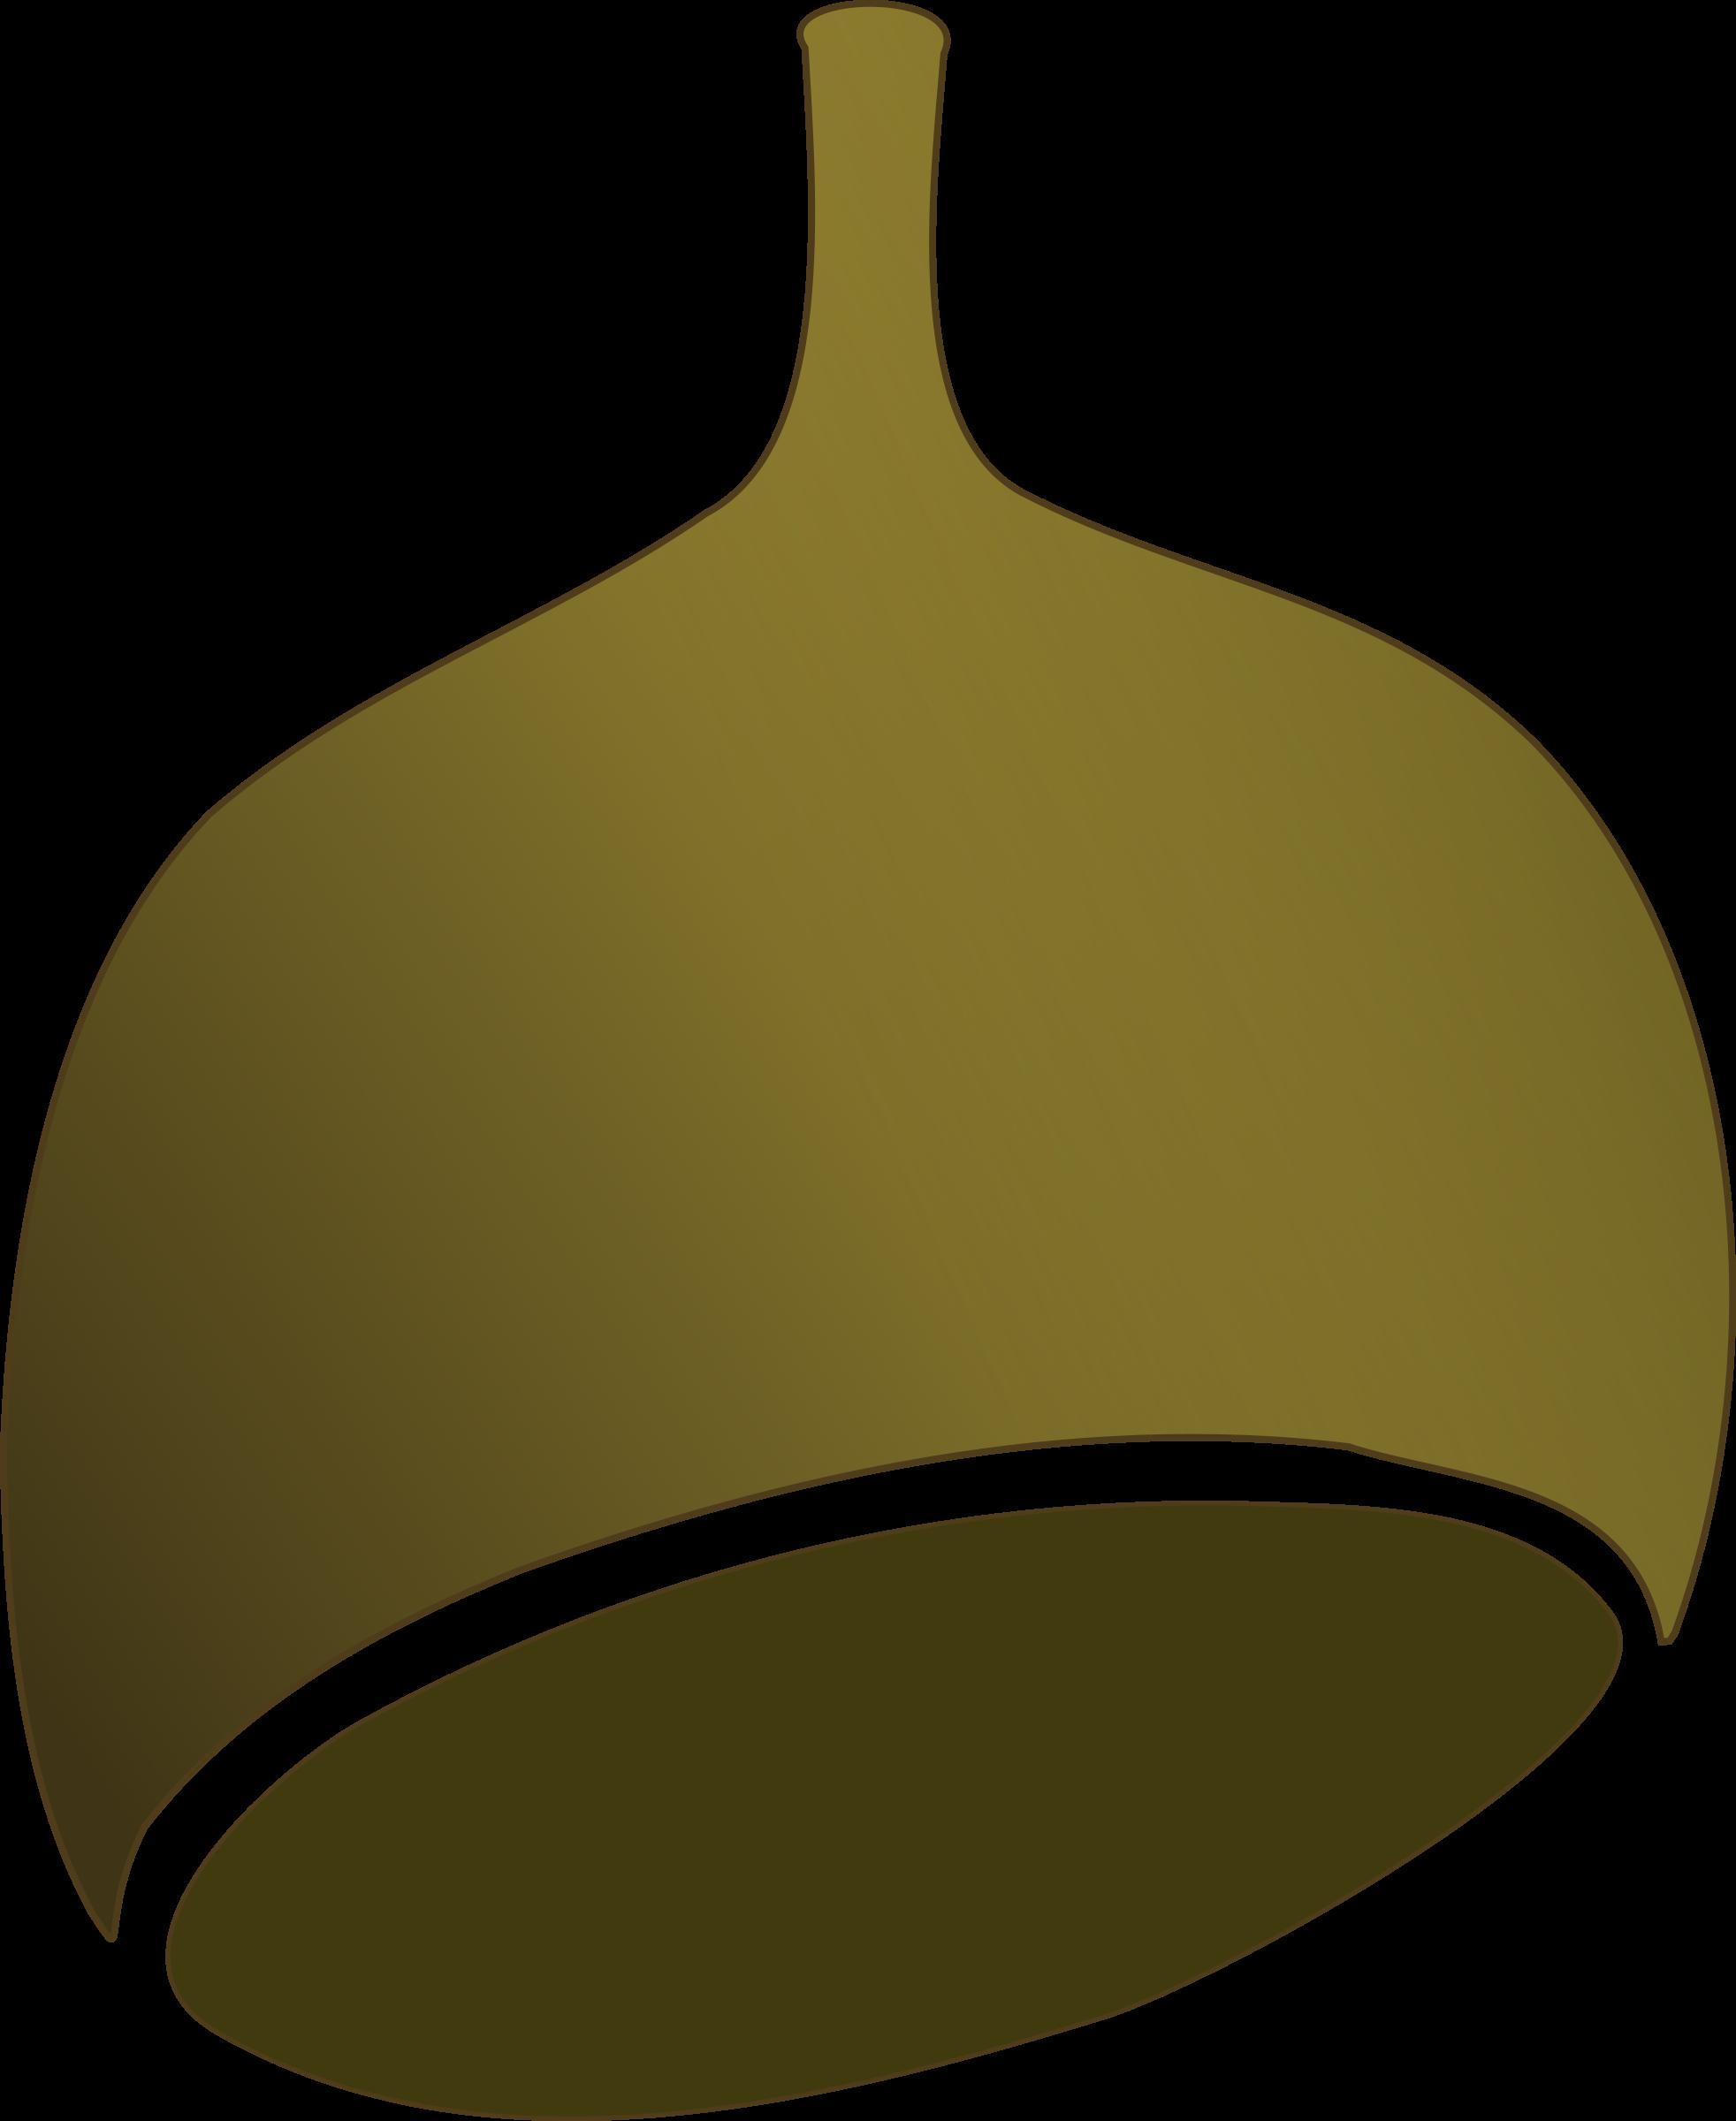 Gumnut shaded big image. Nut clipart pea